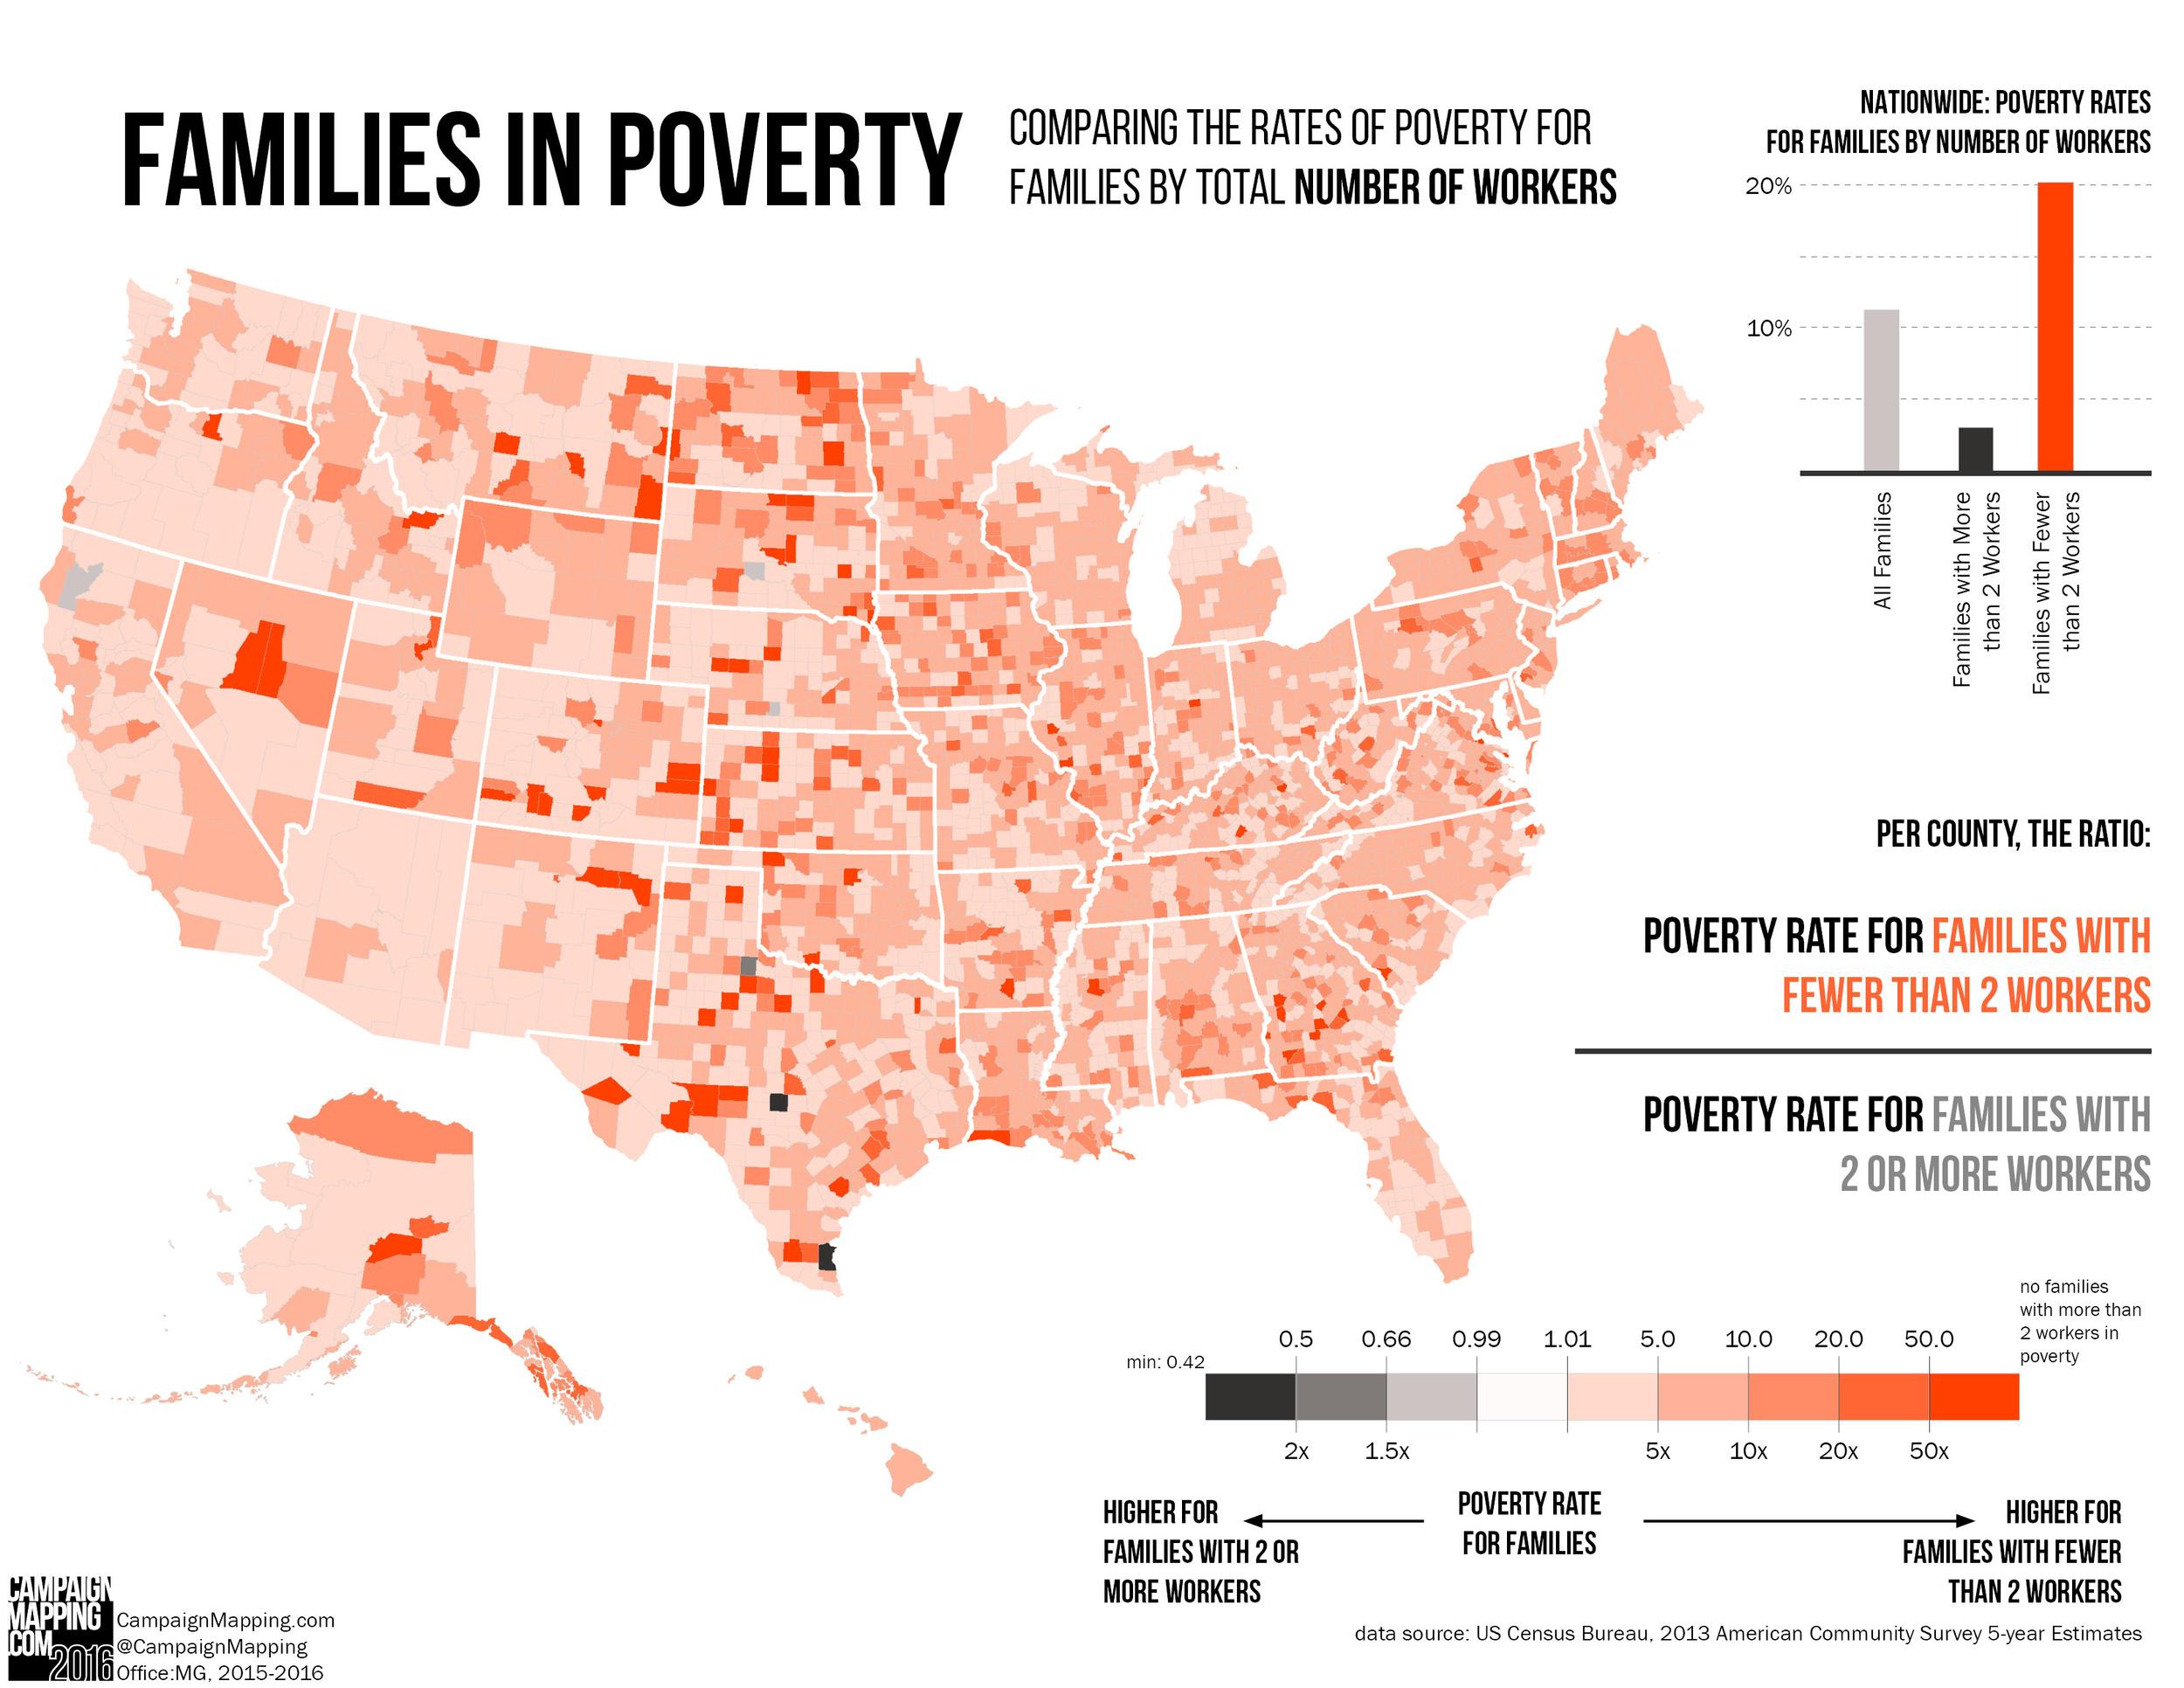 FamiliesInPoverty_Workers_Ratio.jpg